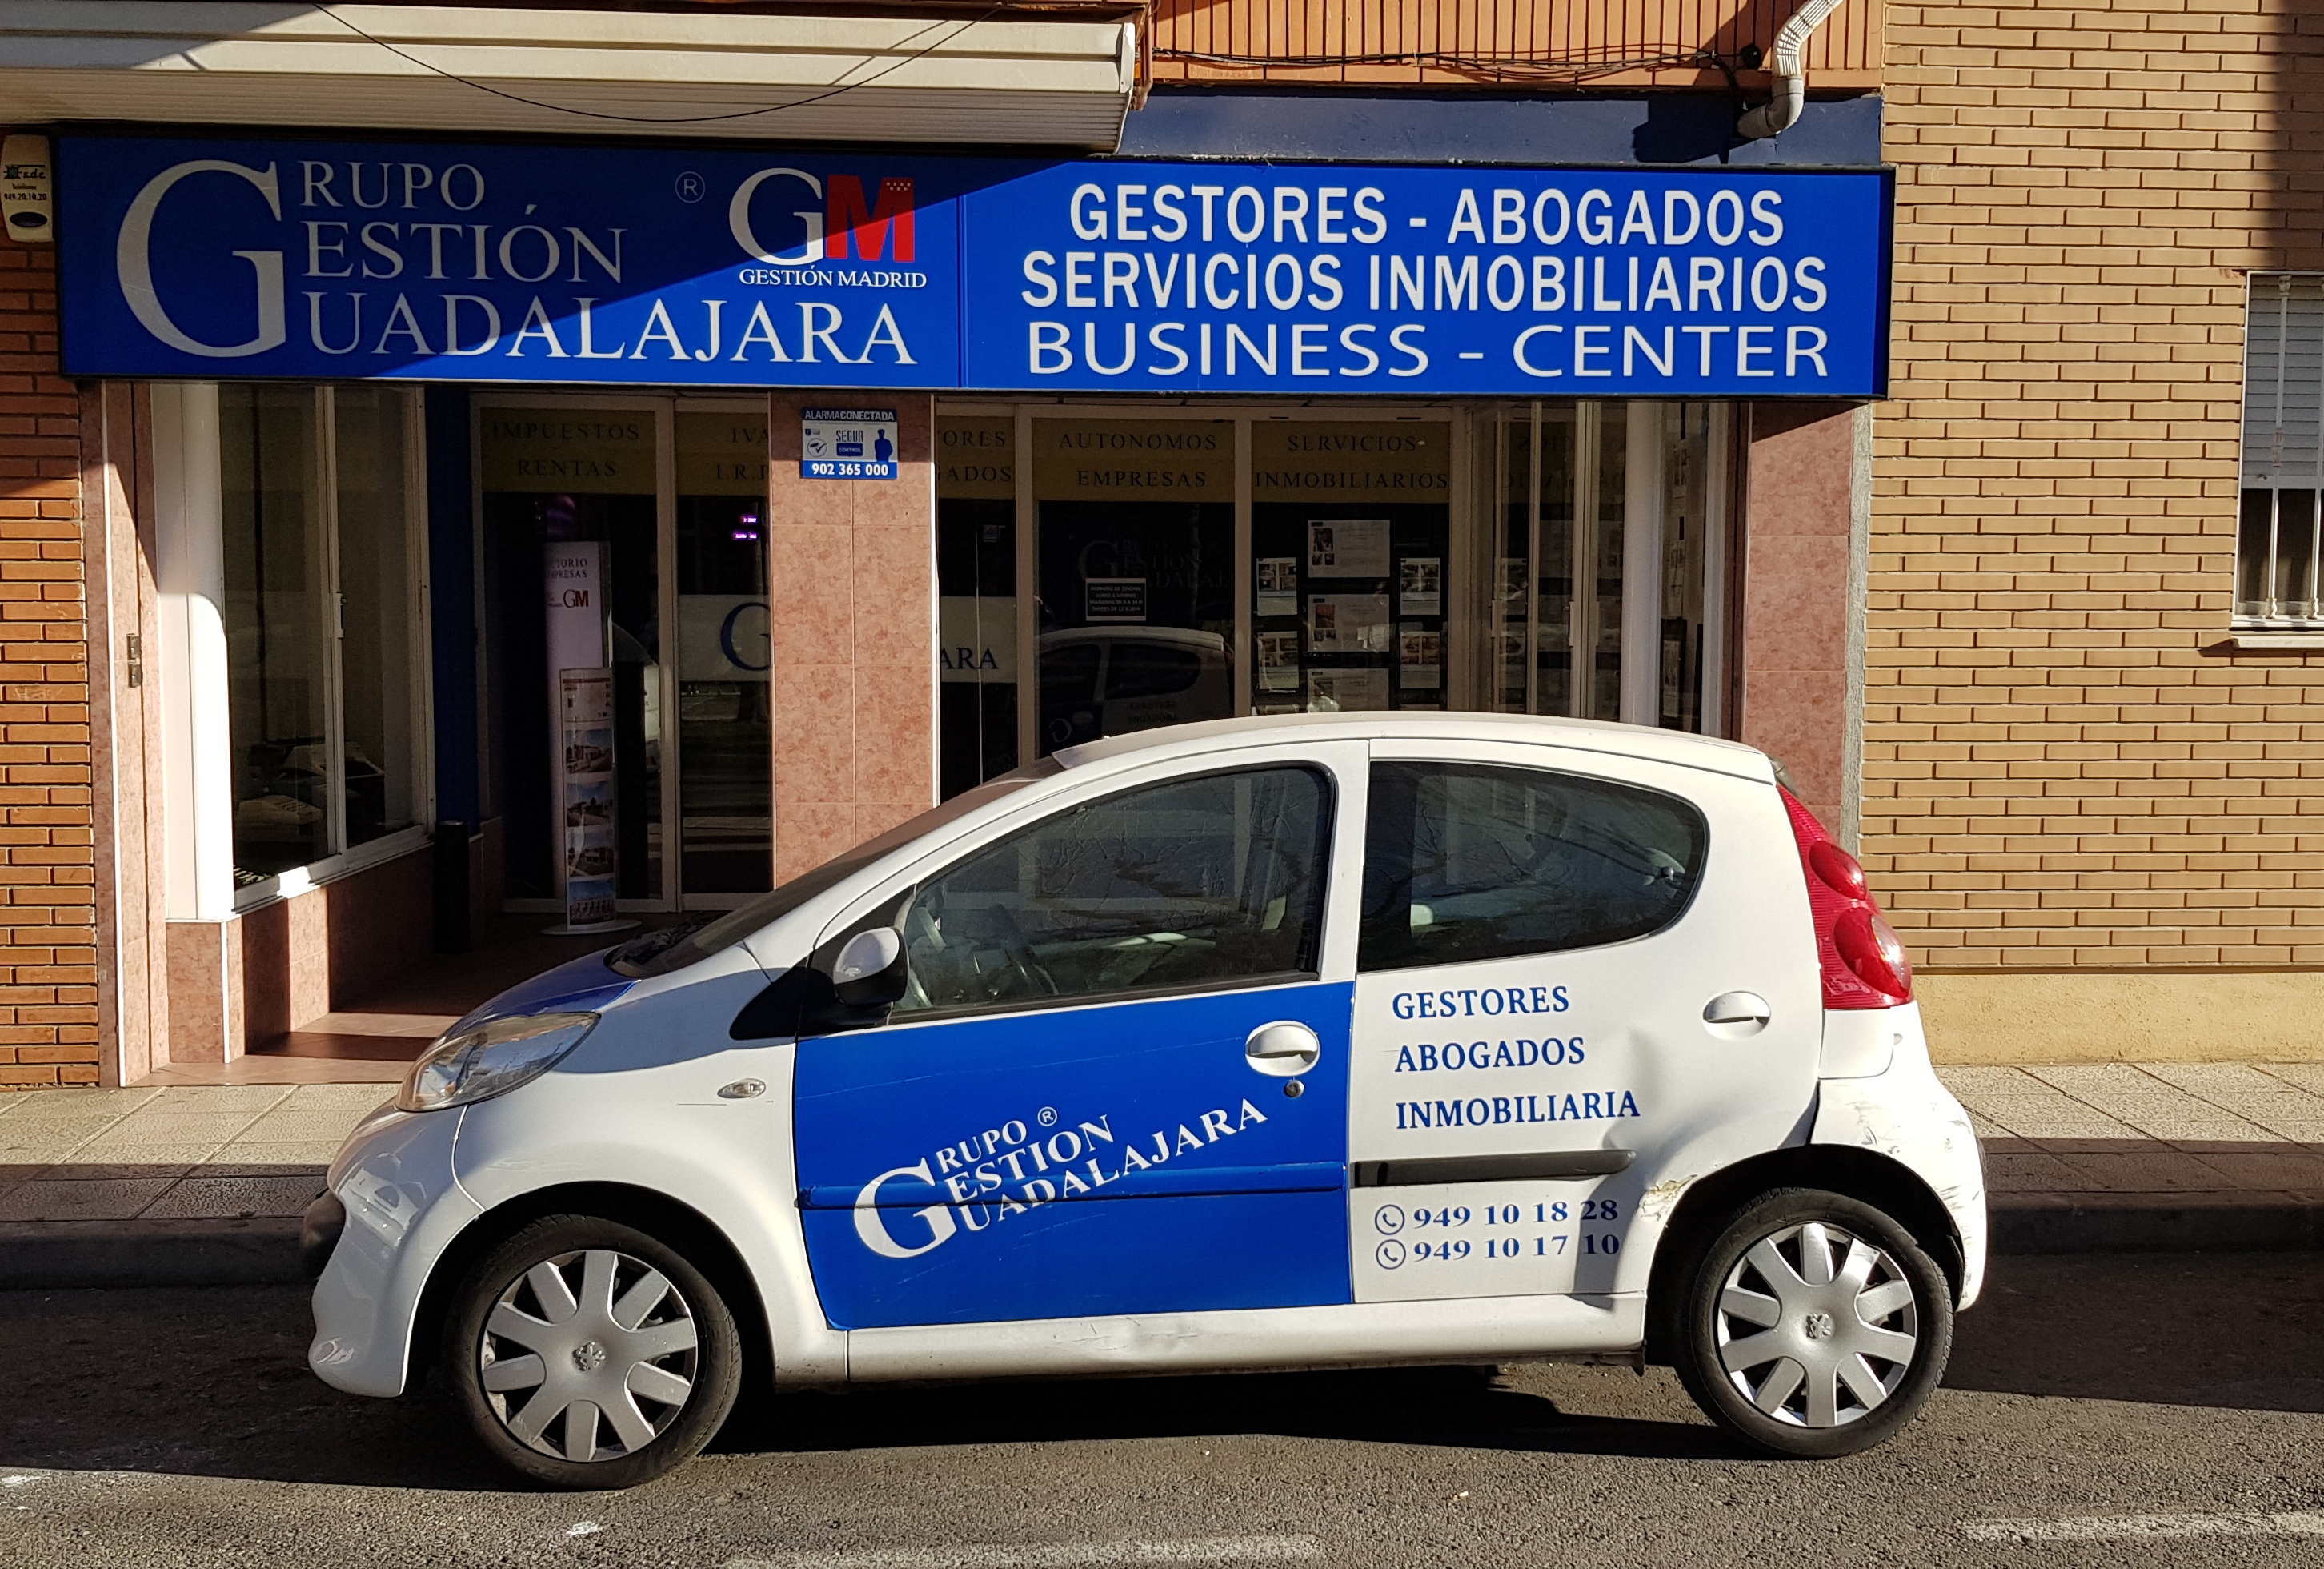 Oficinas Grupo Gestion Guadalajara